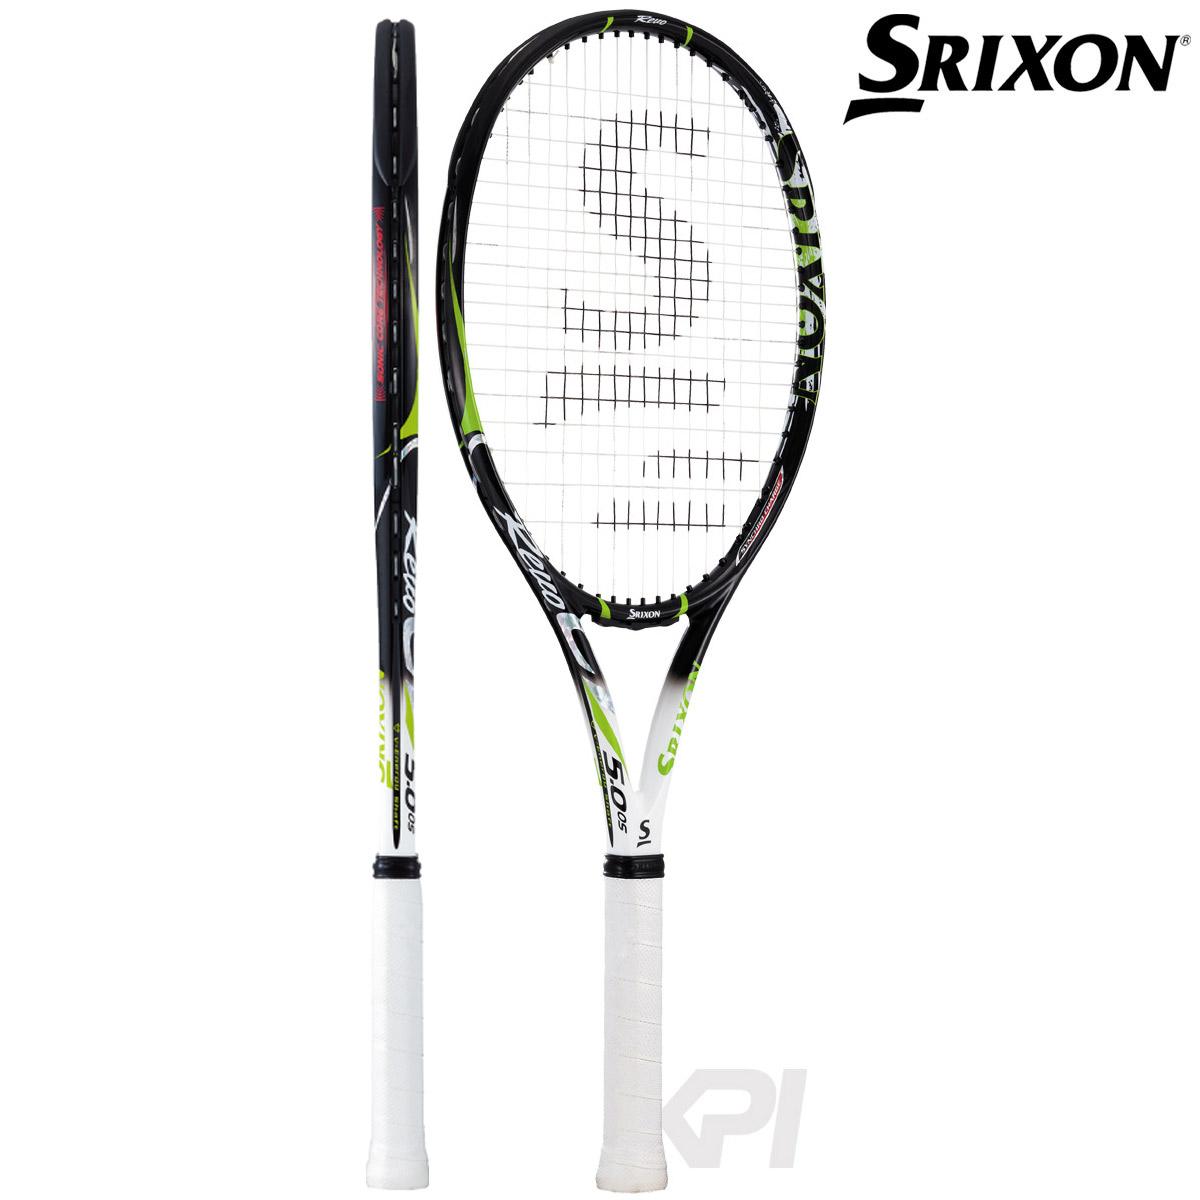 SRIXON(スリクソン)【SRIXON REVO CV 5.0 OS(スリクソンレヴォ 5.0 OS) SR21604】硬式テニスラケット【prospo】【2019春ダンロップ・スリクソンフェスタ】